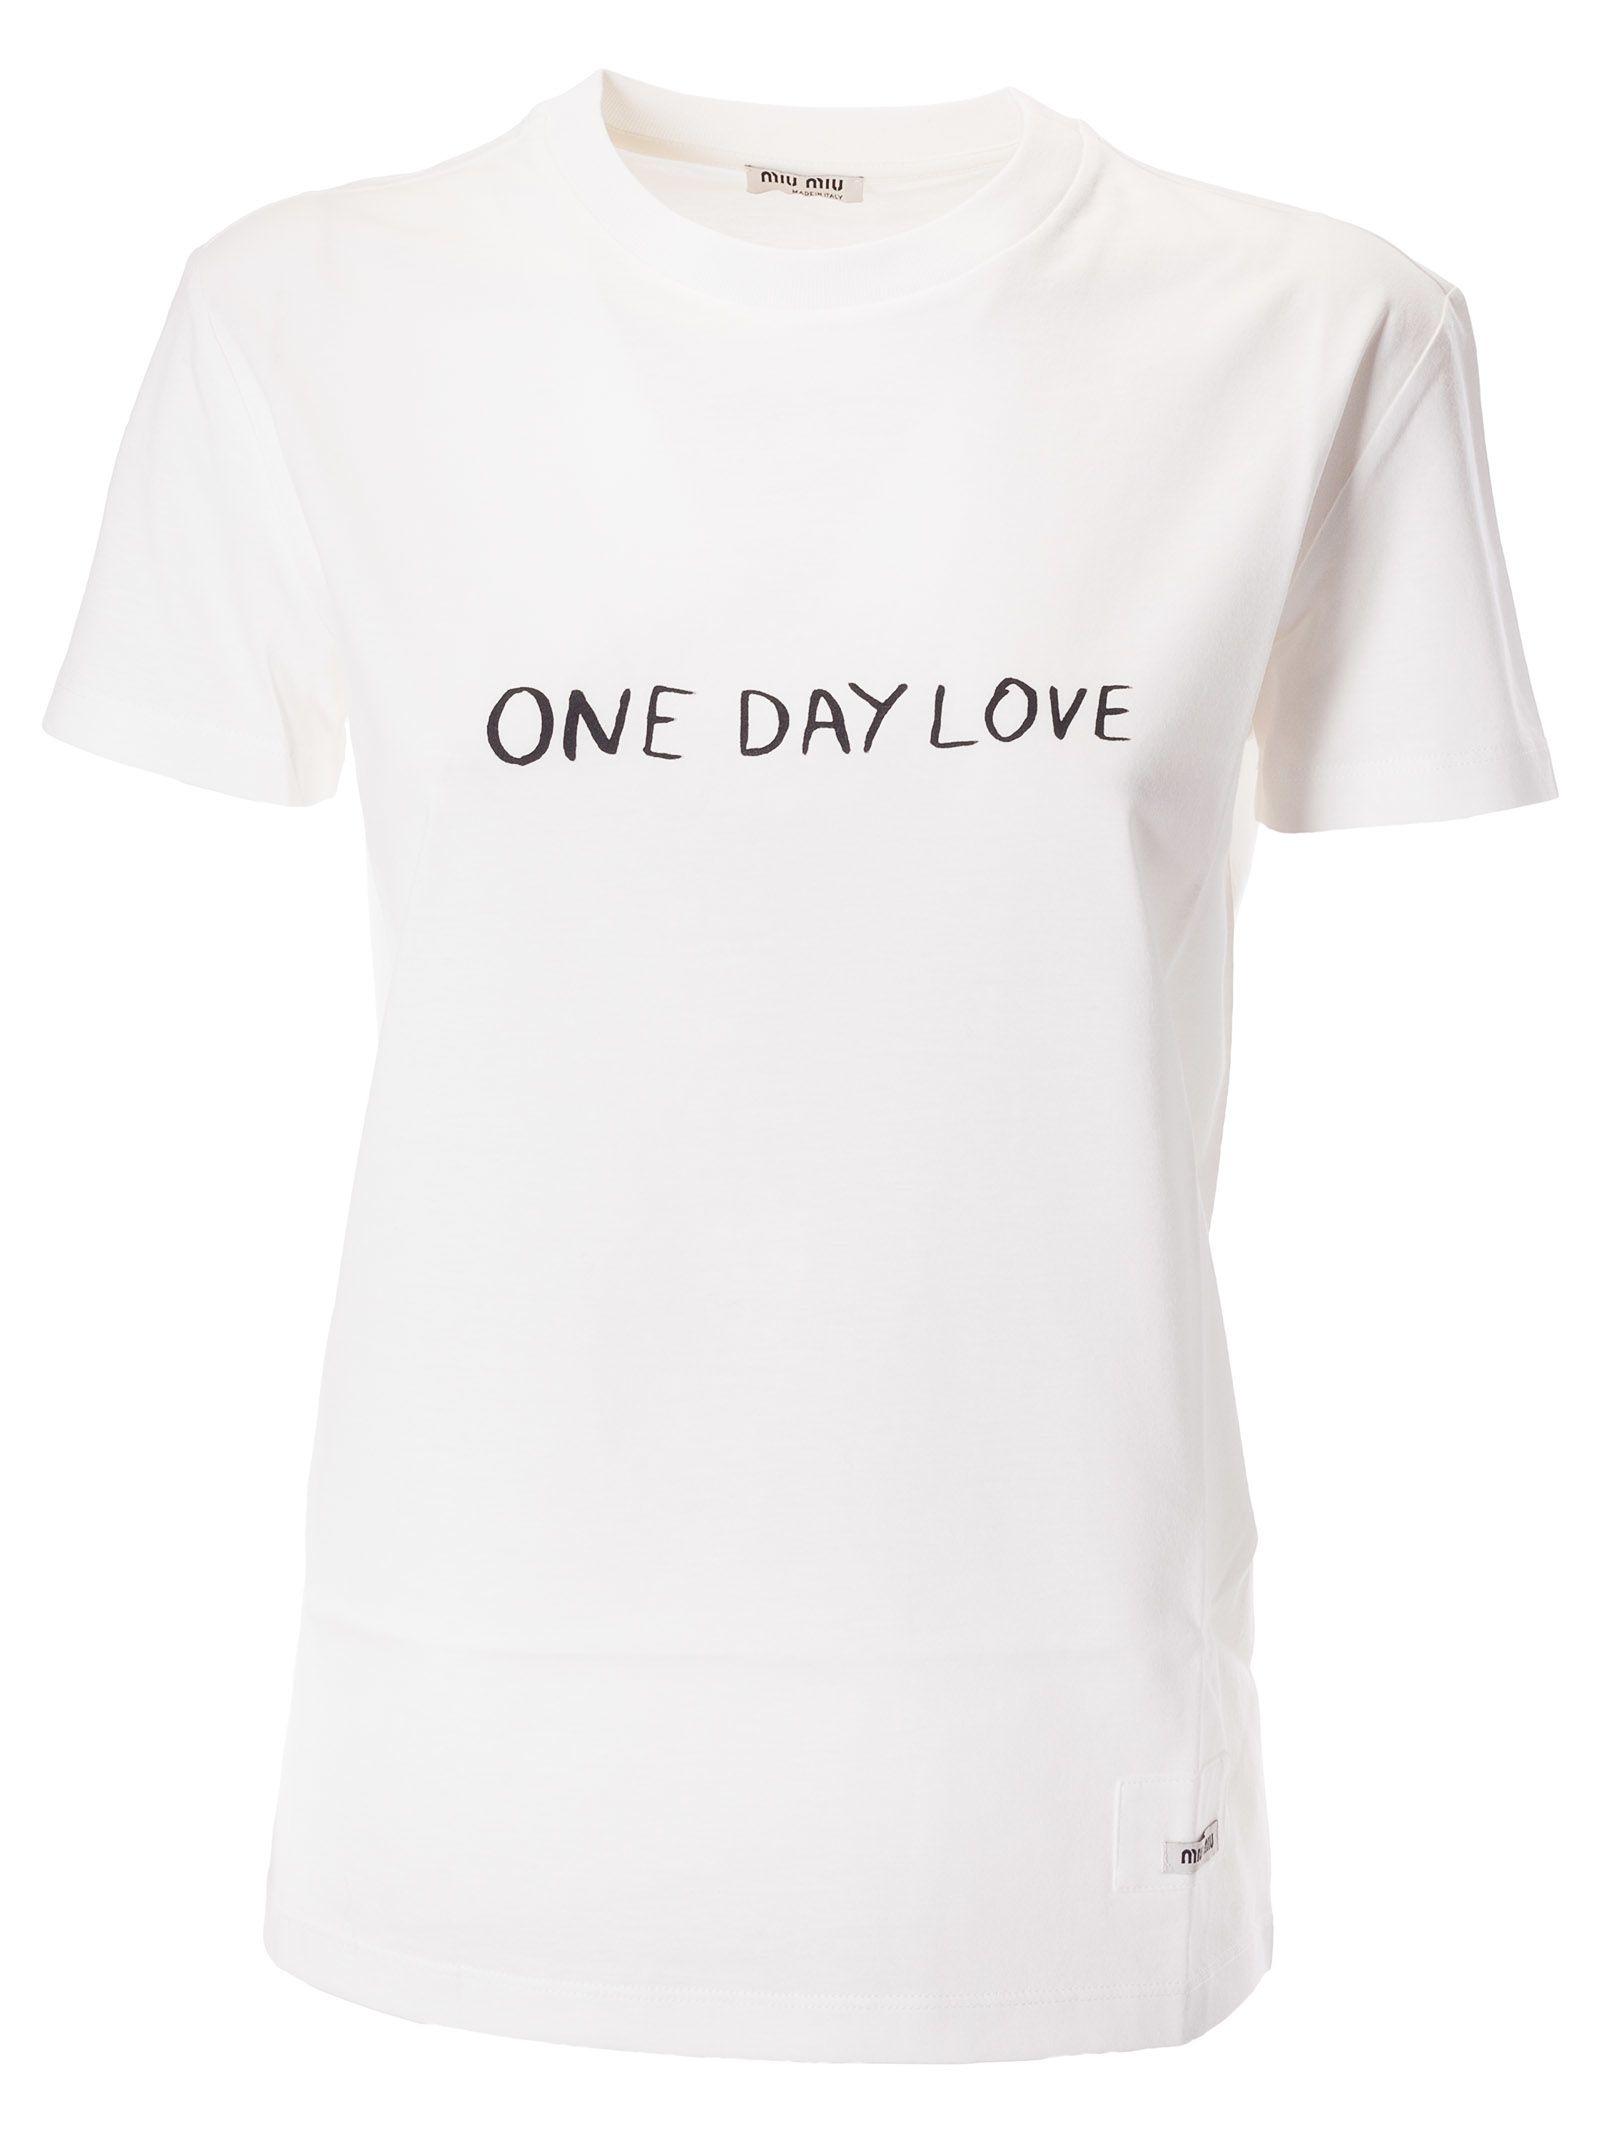 Miu Miu ONE DAY LOVE T-SHIRT